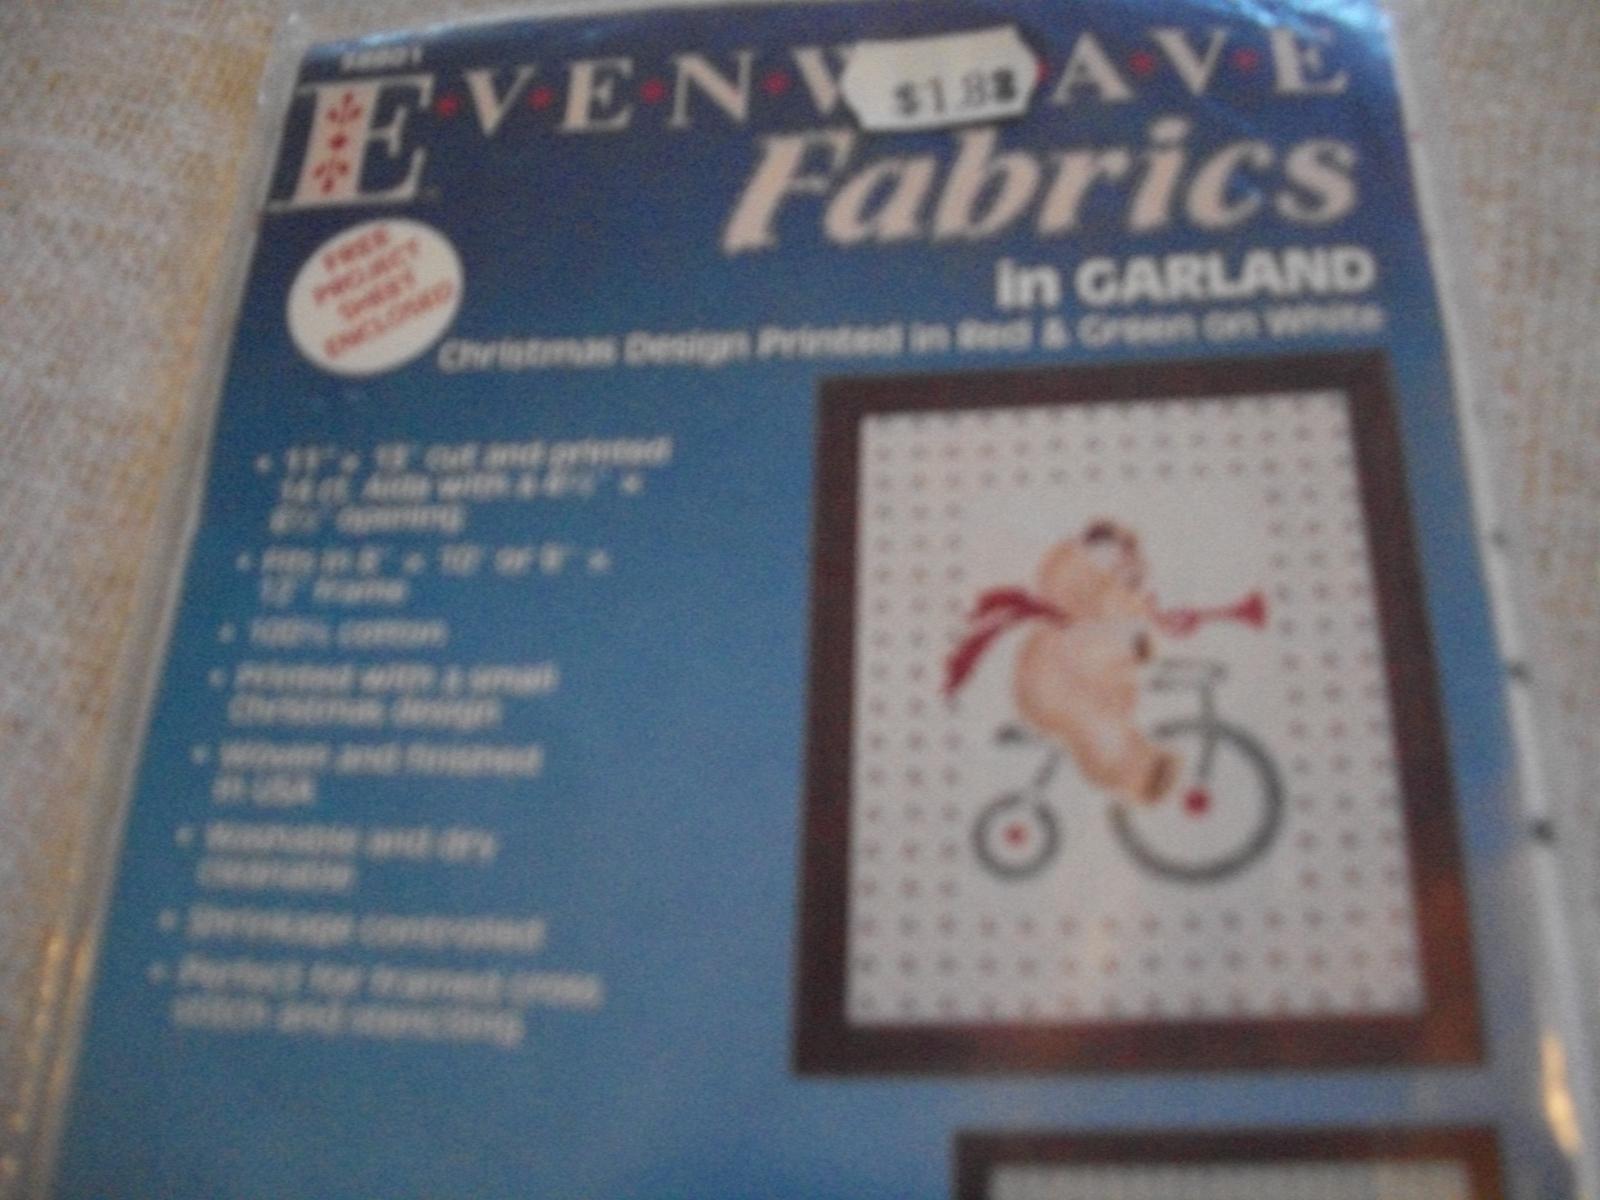 Evenweave Fabric Christmas Design - $5.00